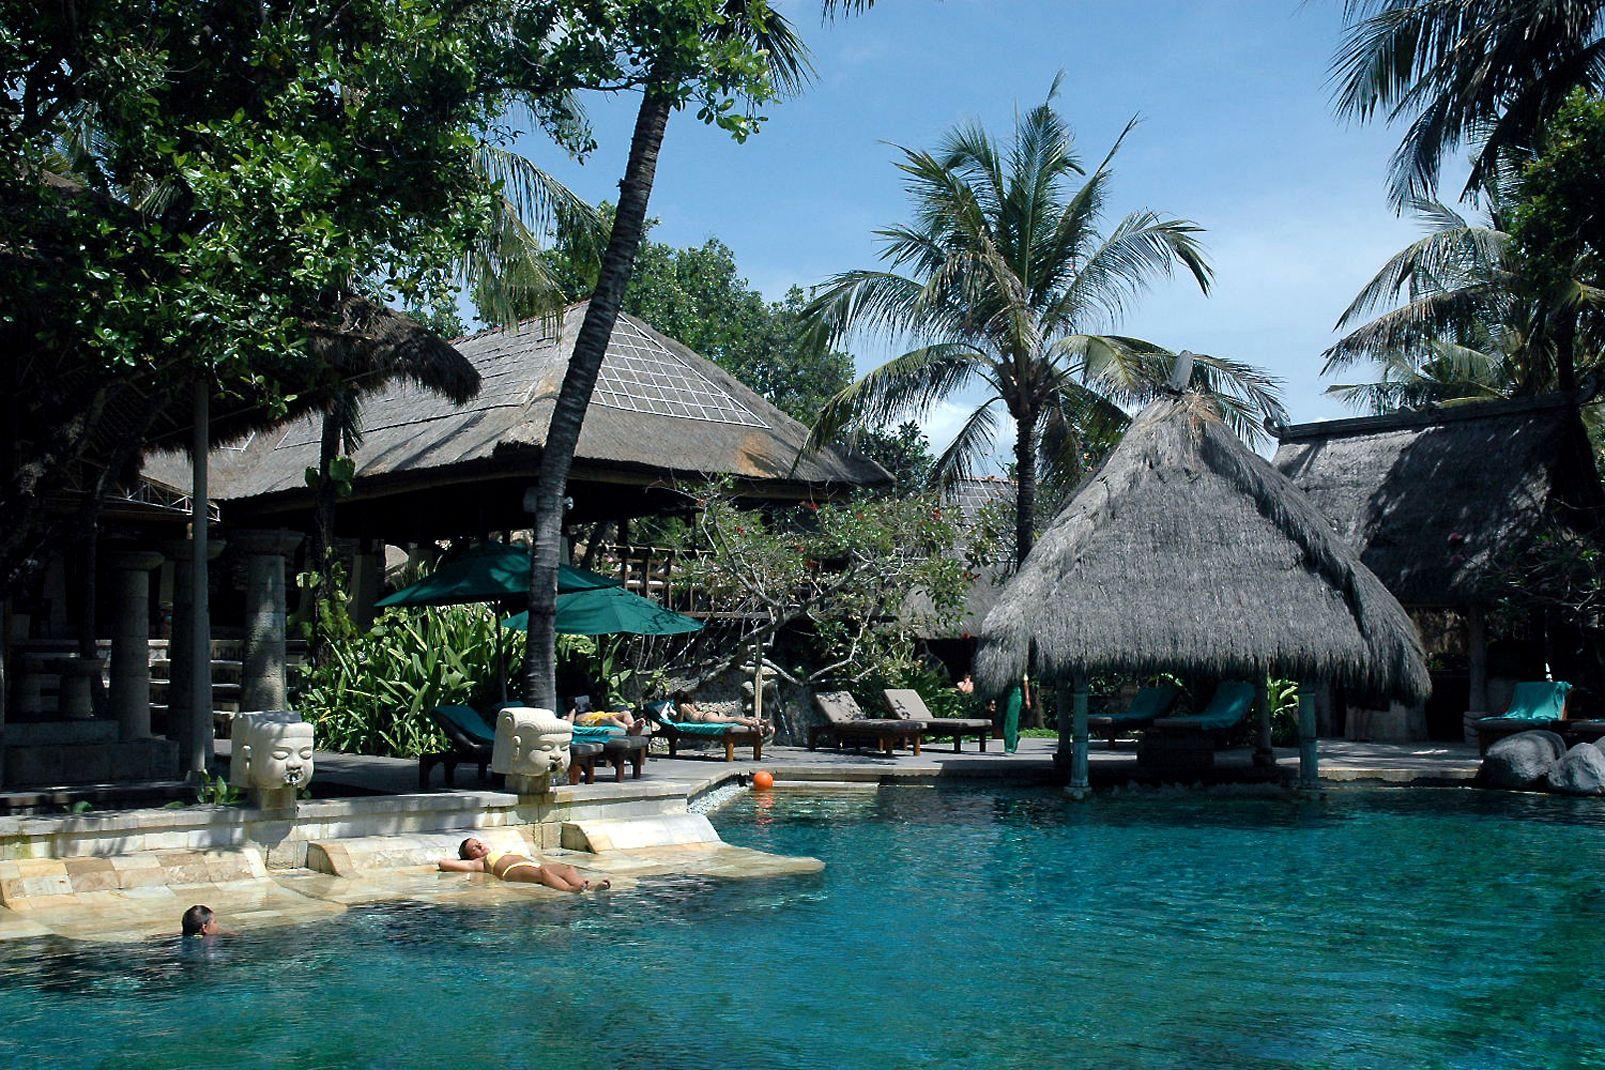 Hôtel Novotel Bali Benoa - Chambre De Luxe 4* - 1